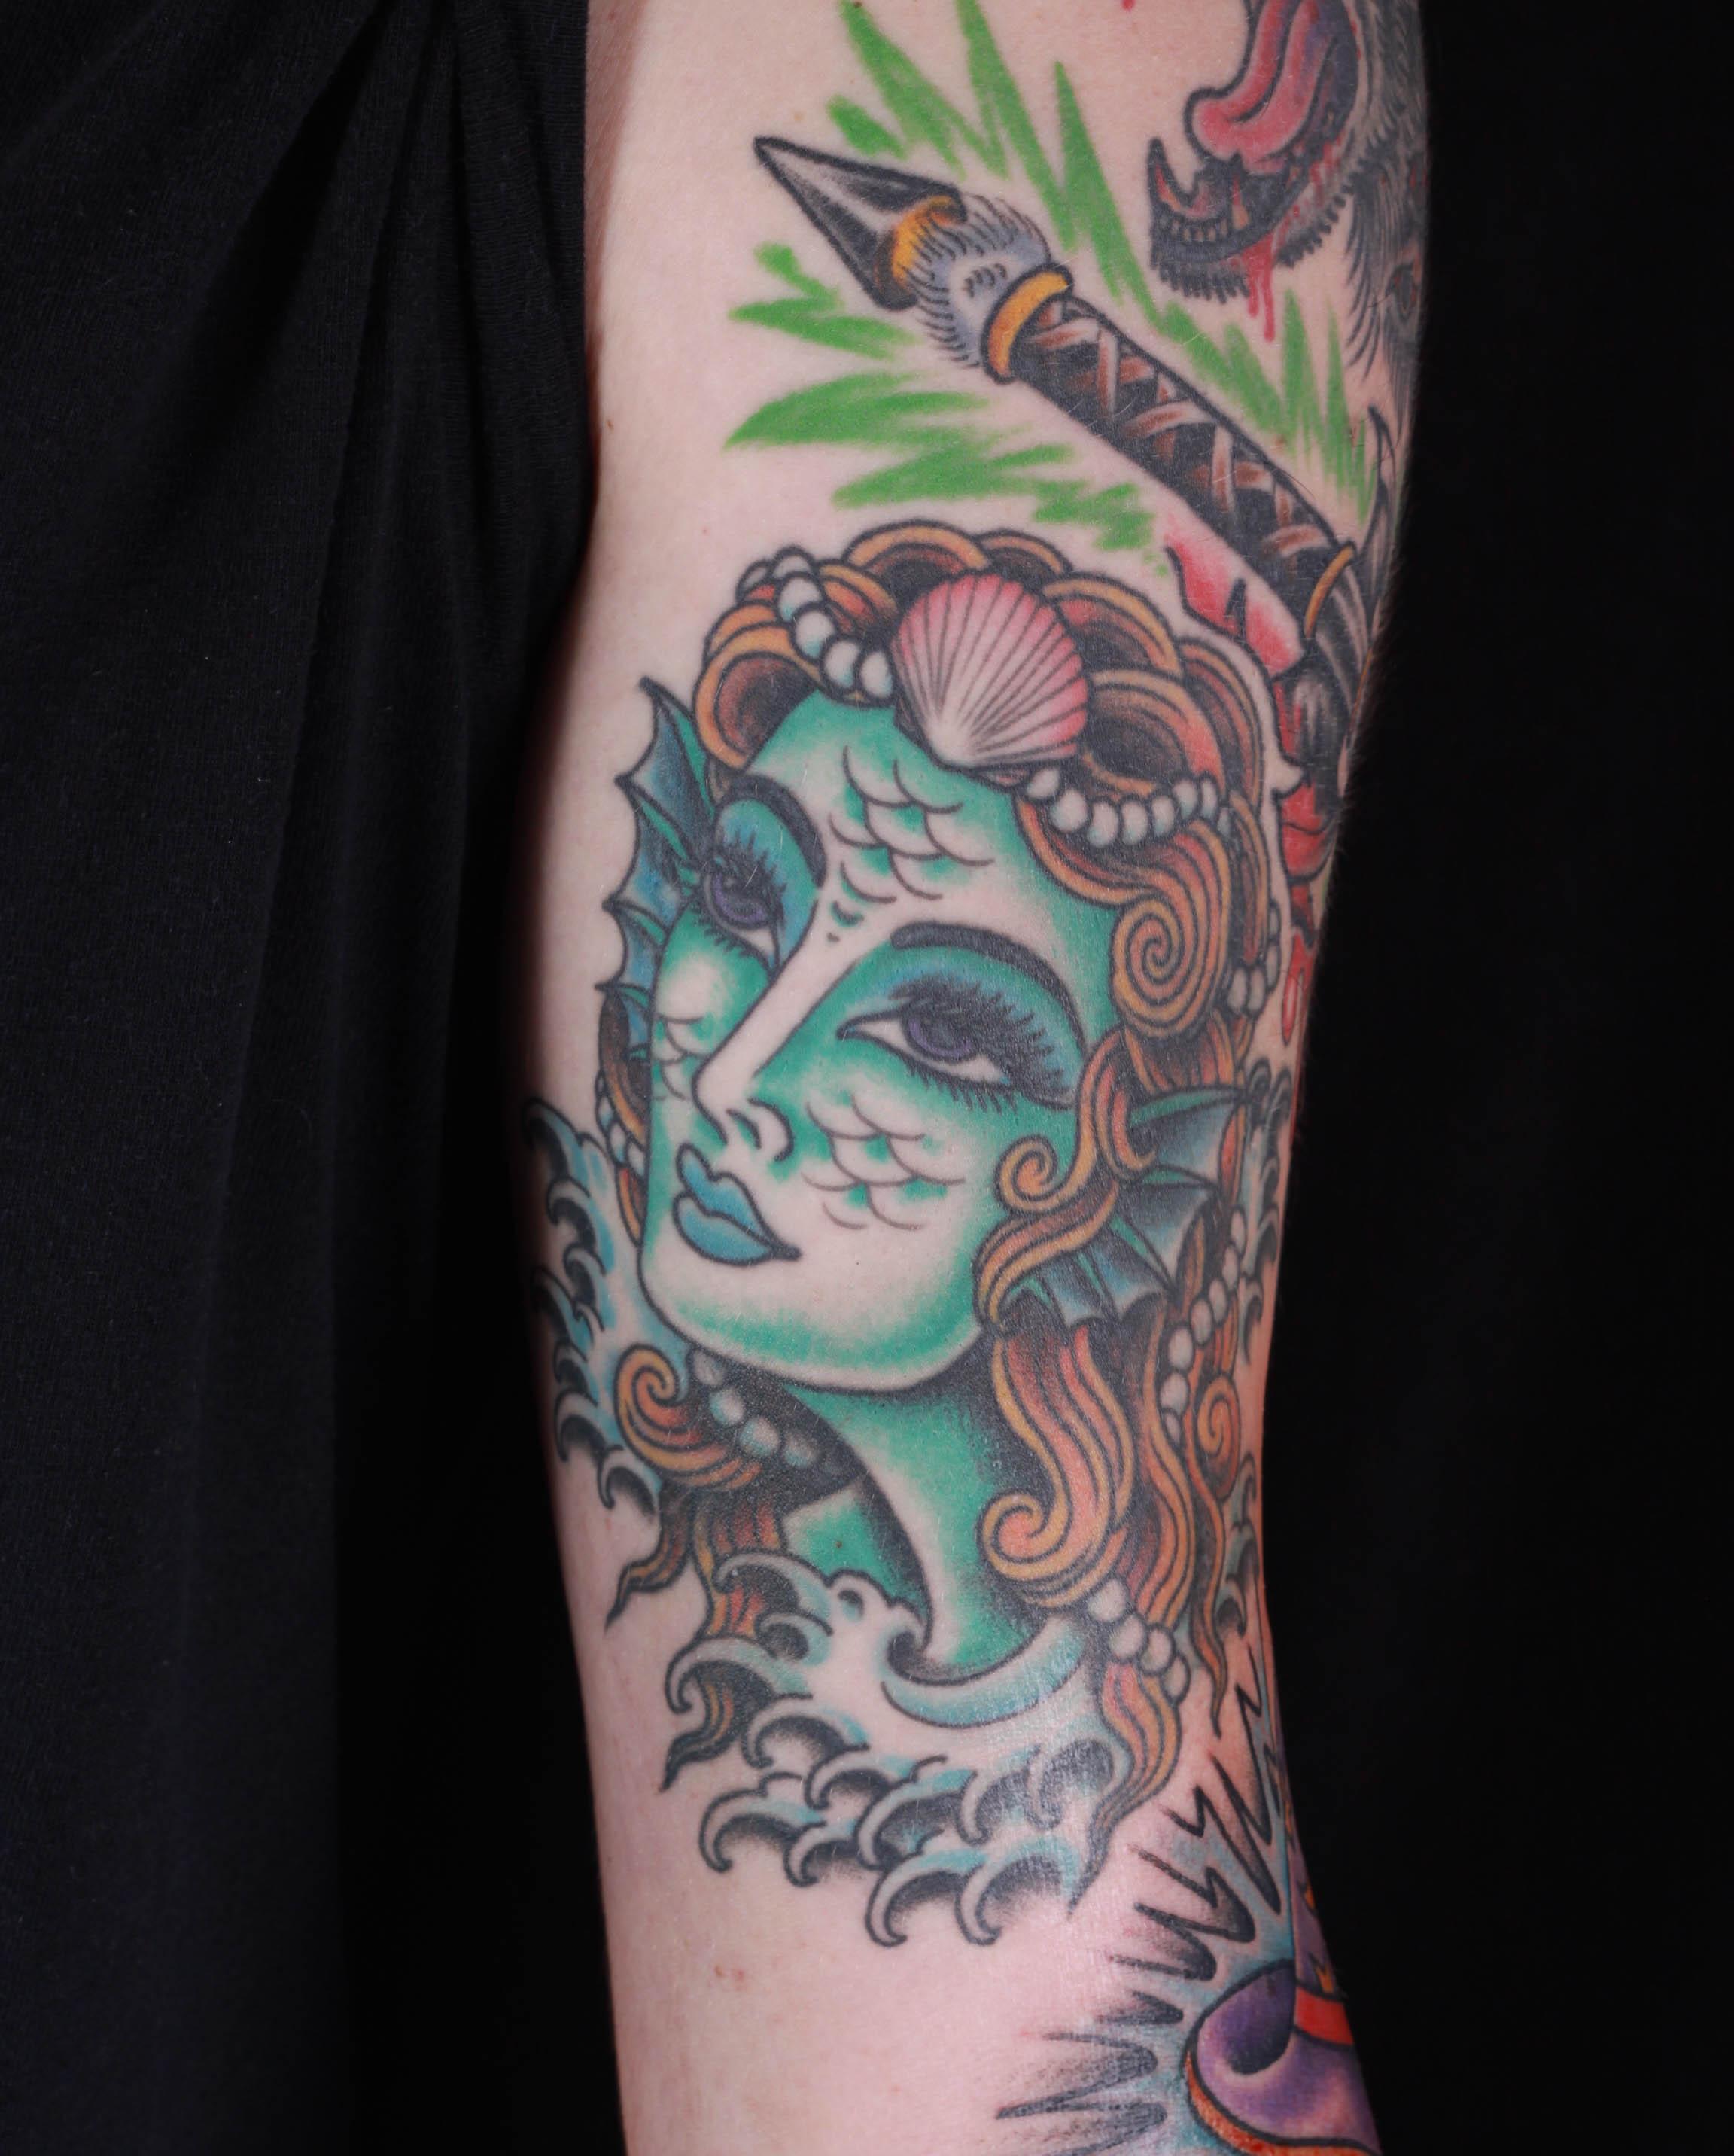 brian-thurow-dedication-tattoo-mermaid-girl-waves-forearm